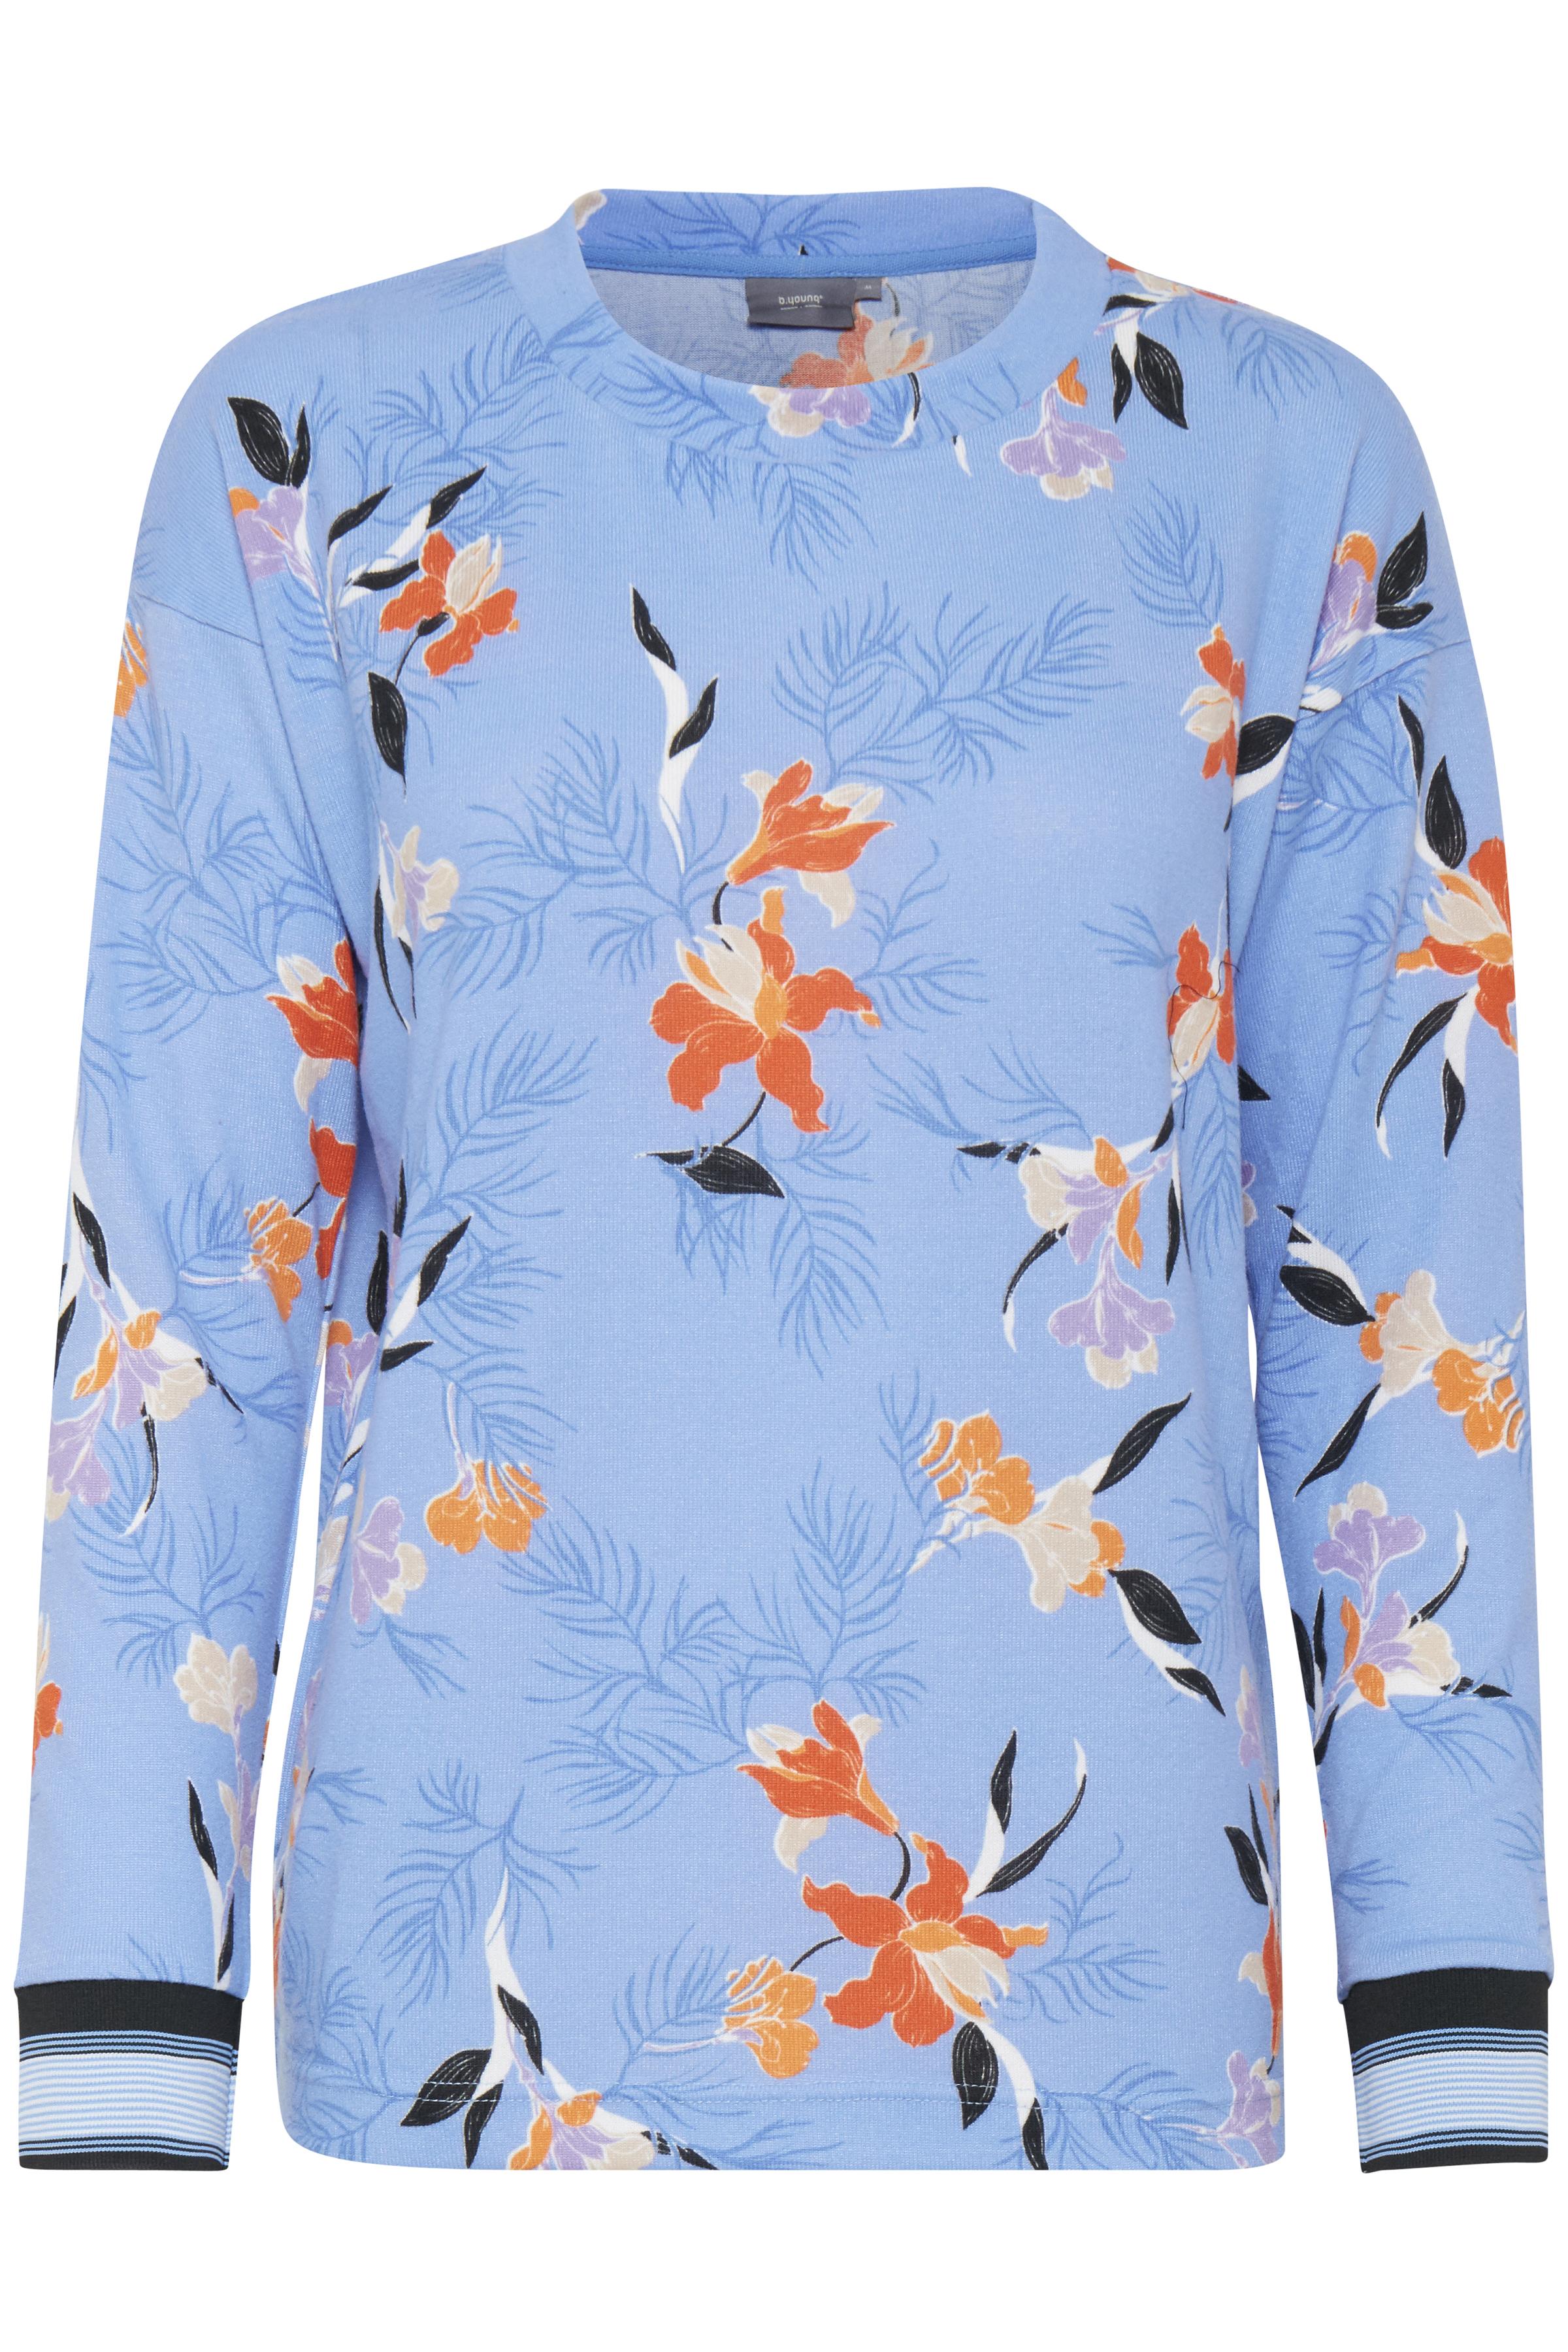 Cornflower blue combi 1 Langærmet bluse fra b.young – Køb Cornflower blue combi 1 Langærmet bluse fra str. XS-XXL her